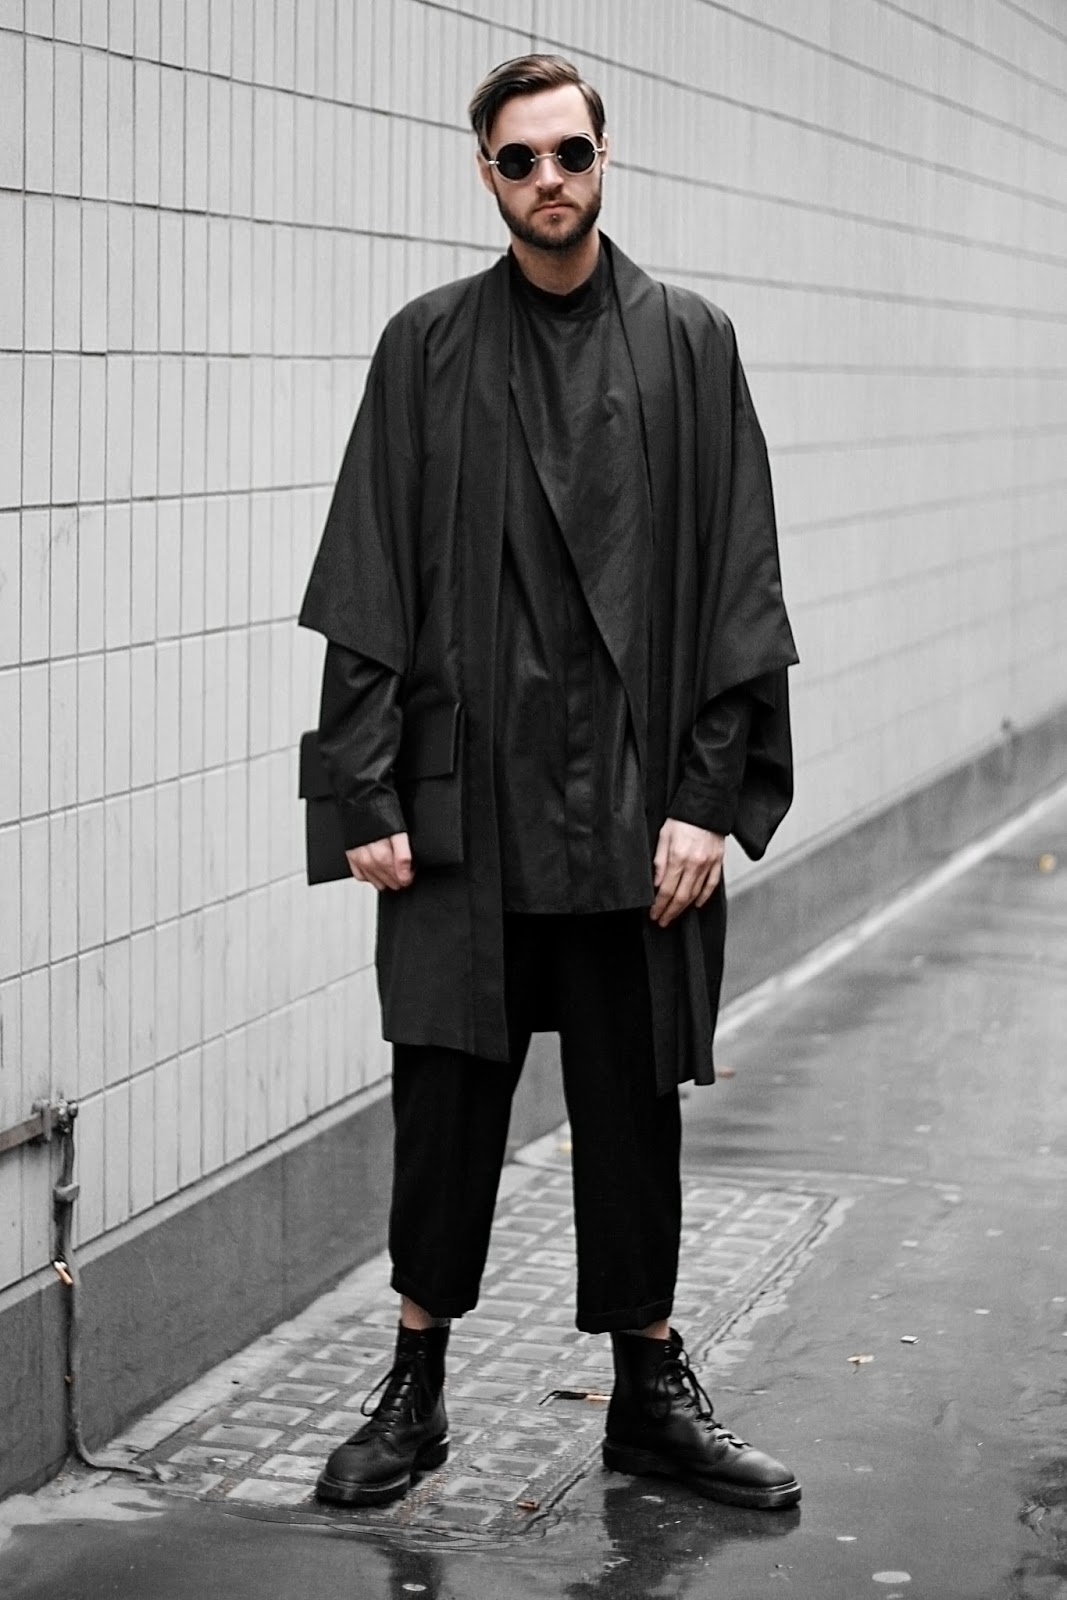 His Name Is Fashion His Name Is Samurai